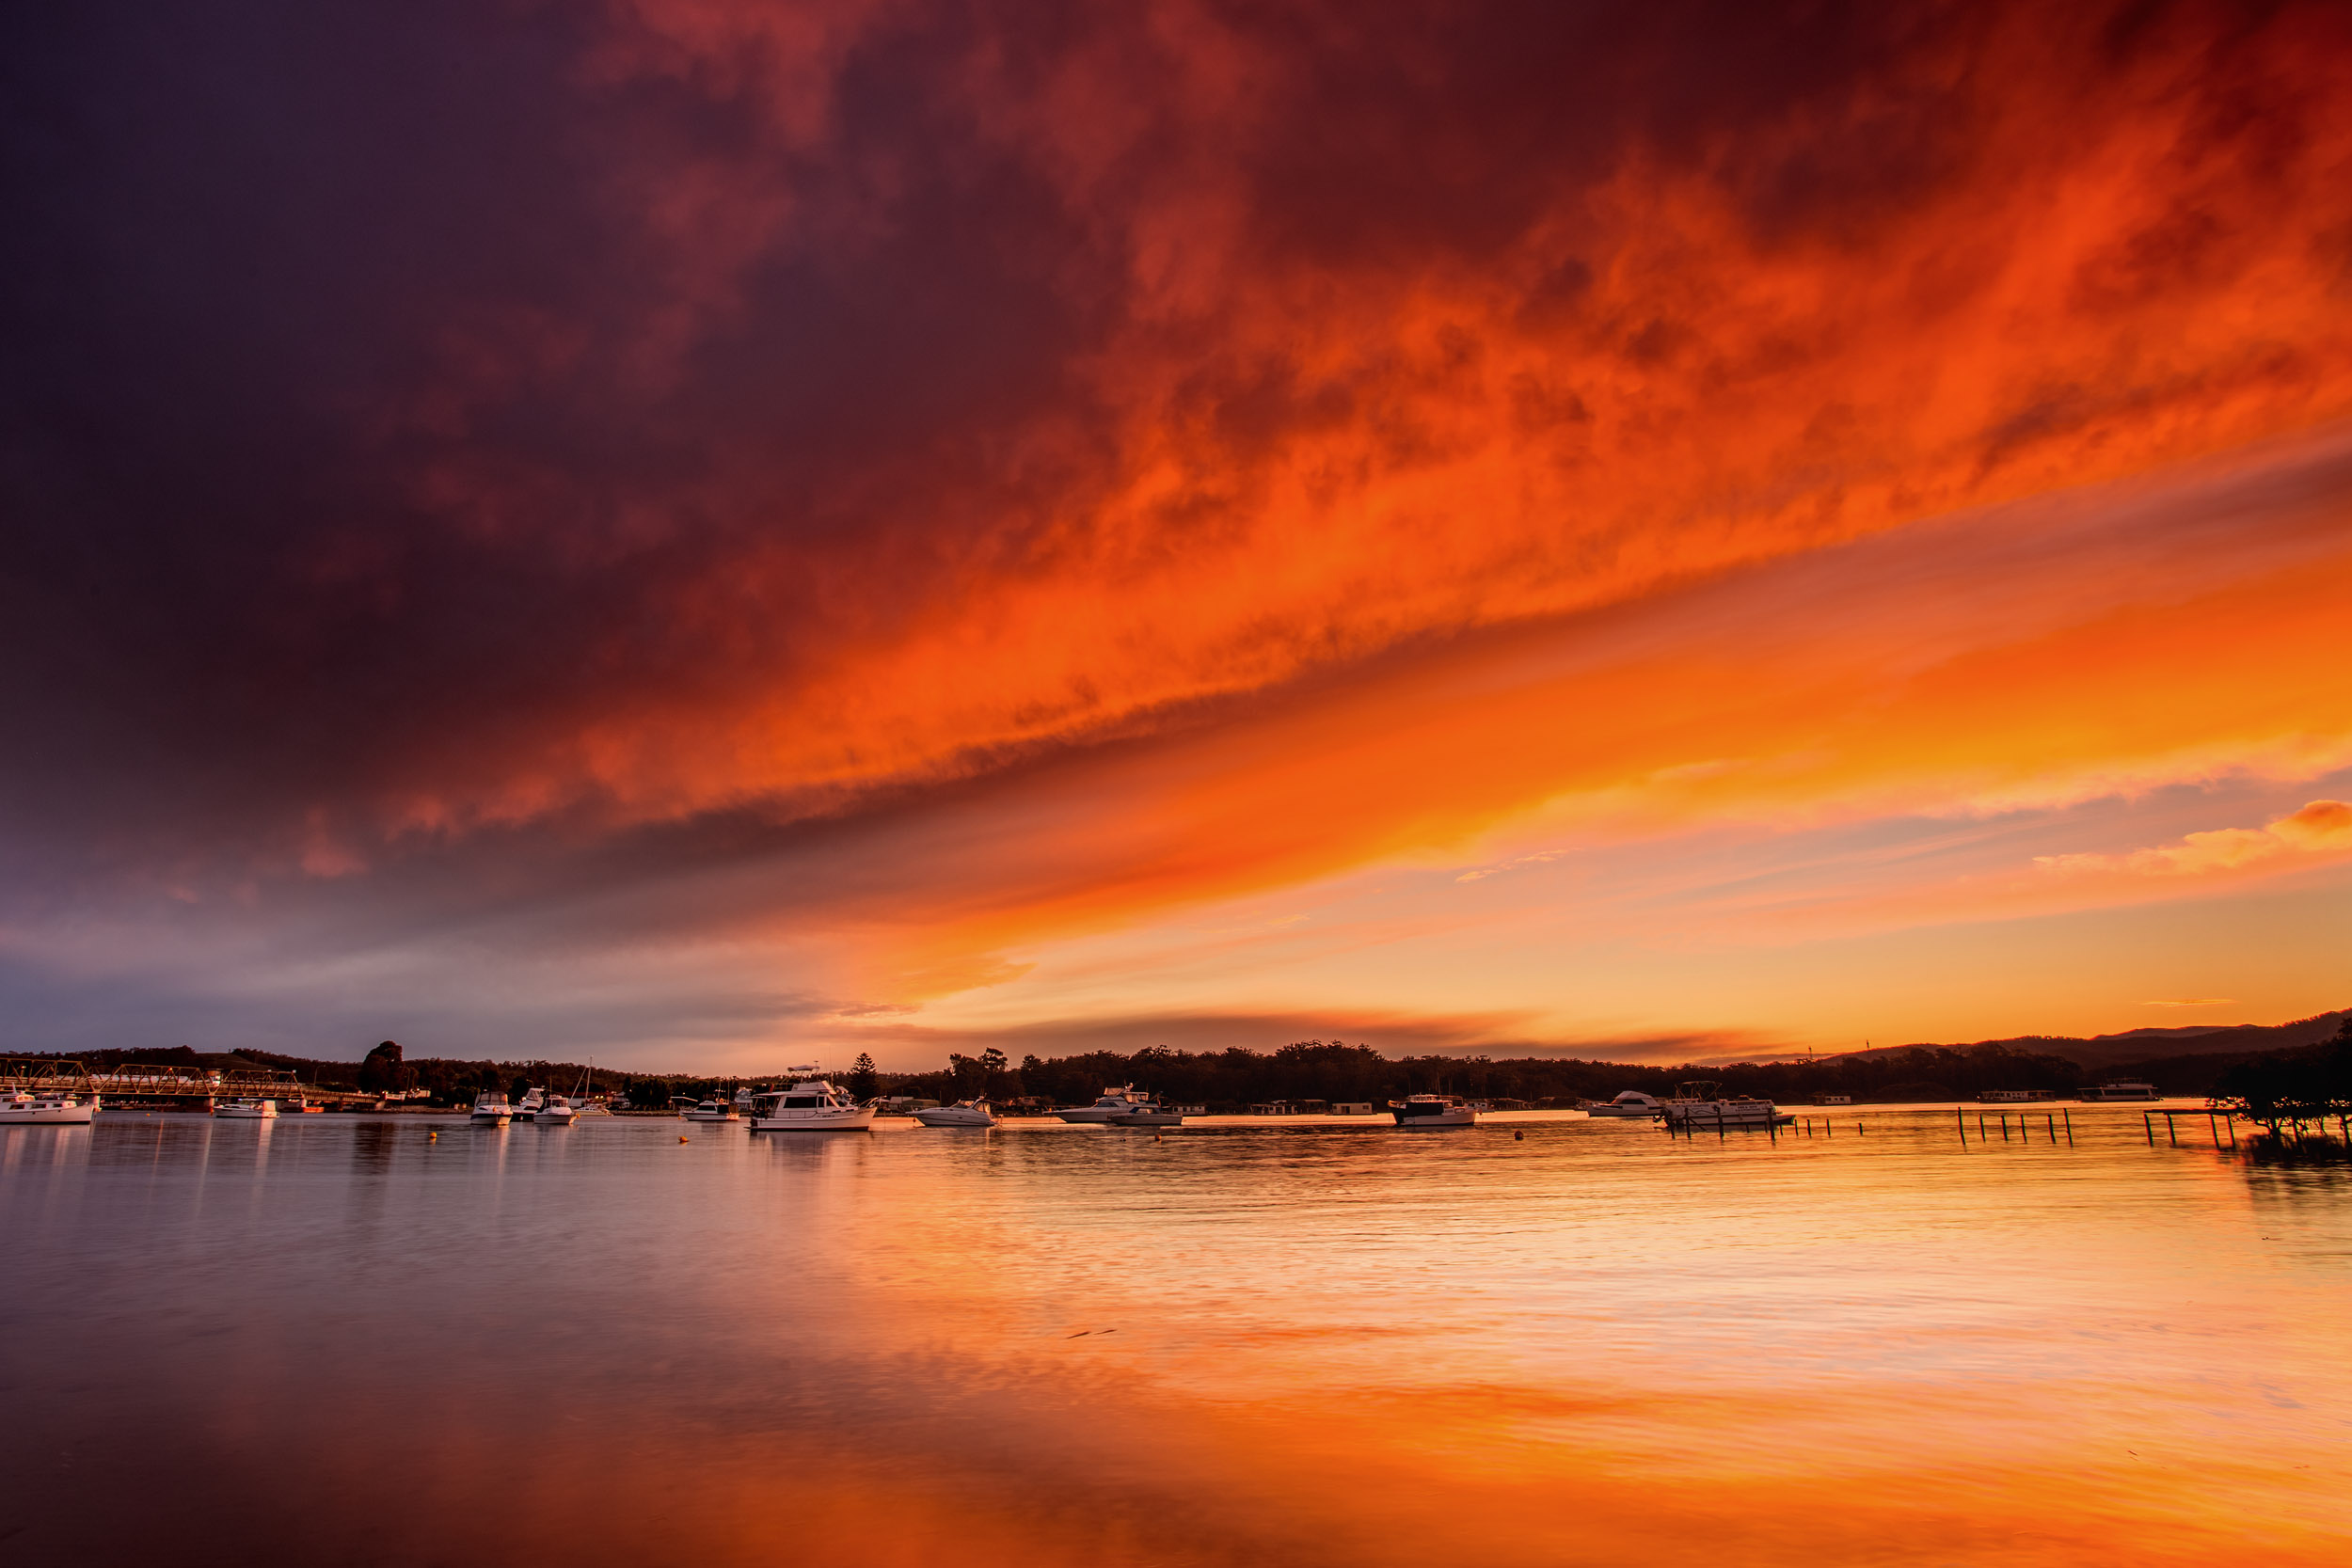 batemans-bay-sunset-nsw-south-coast.jpg